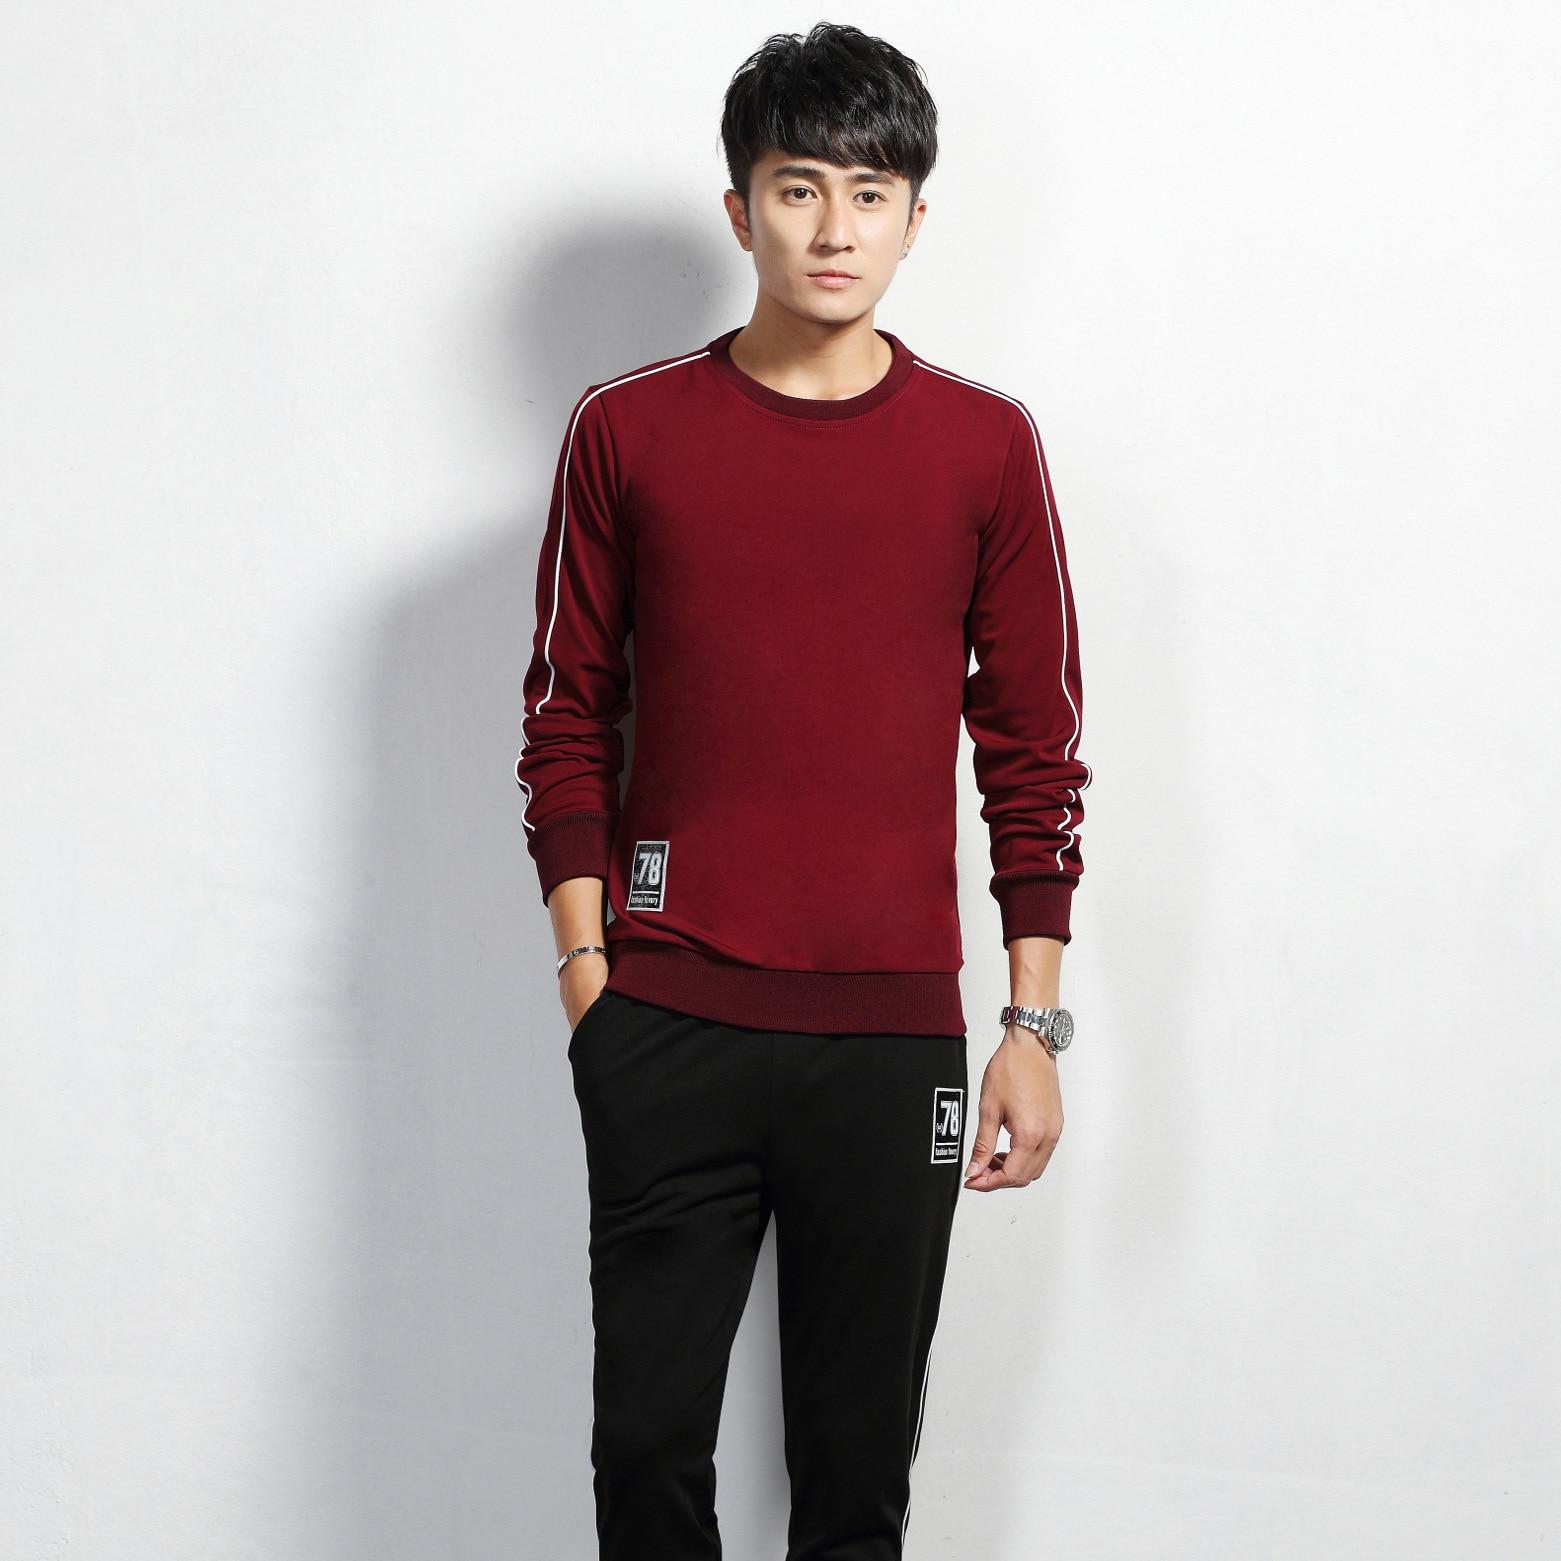 Two-Piece Set Long-sleeved T-shirt Men's Spring And Autumn Korean-style Trend Crew Neck Large Size Men Leisure Sports Suit Autum